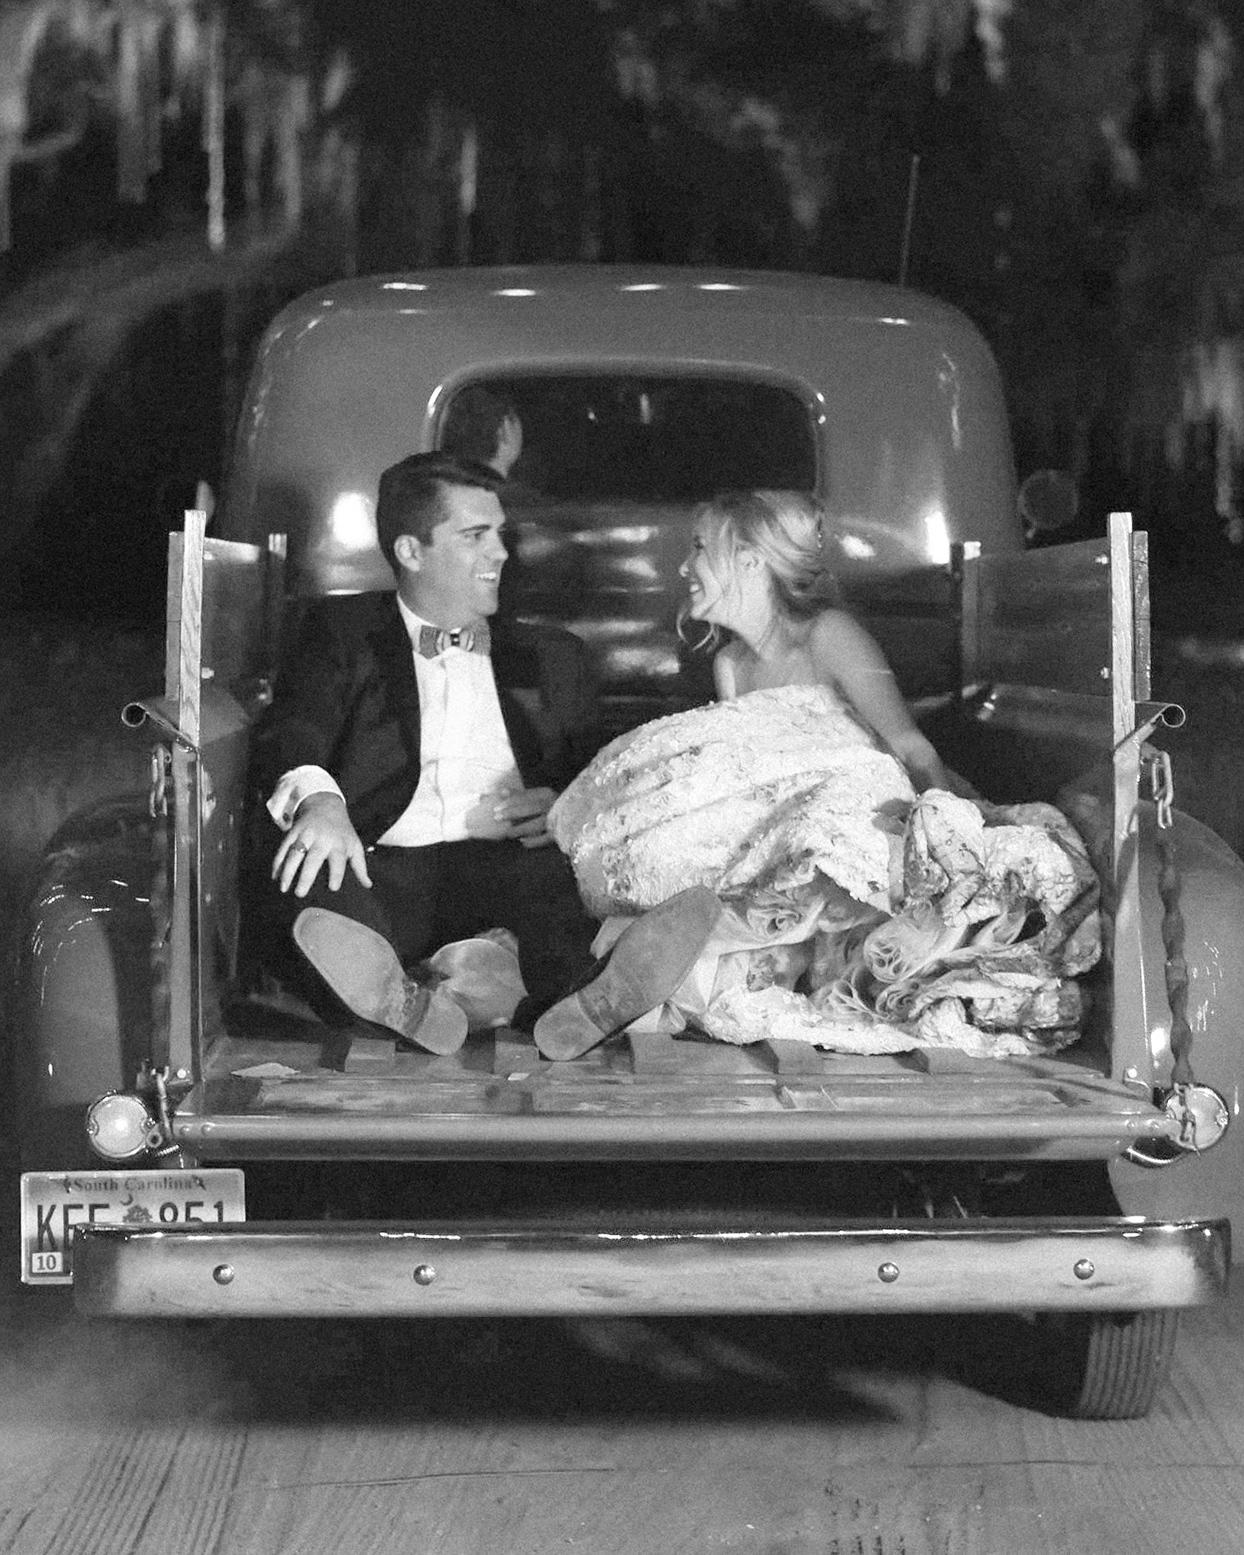 chelsea john wedding exit in back of pickup truck